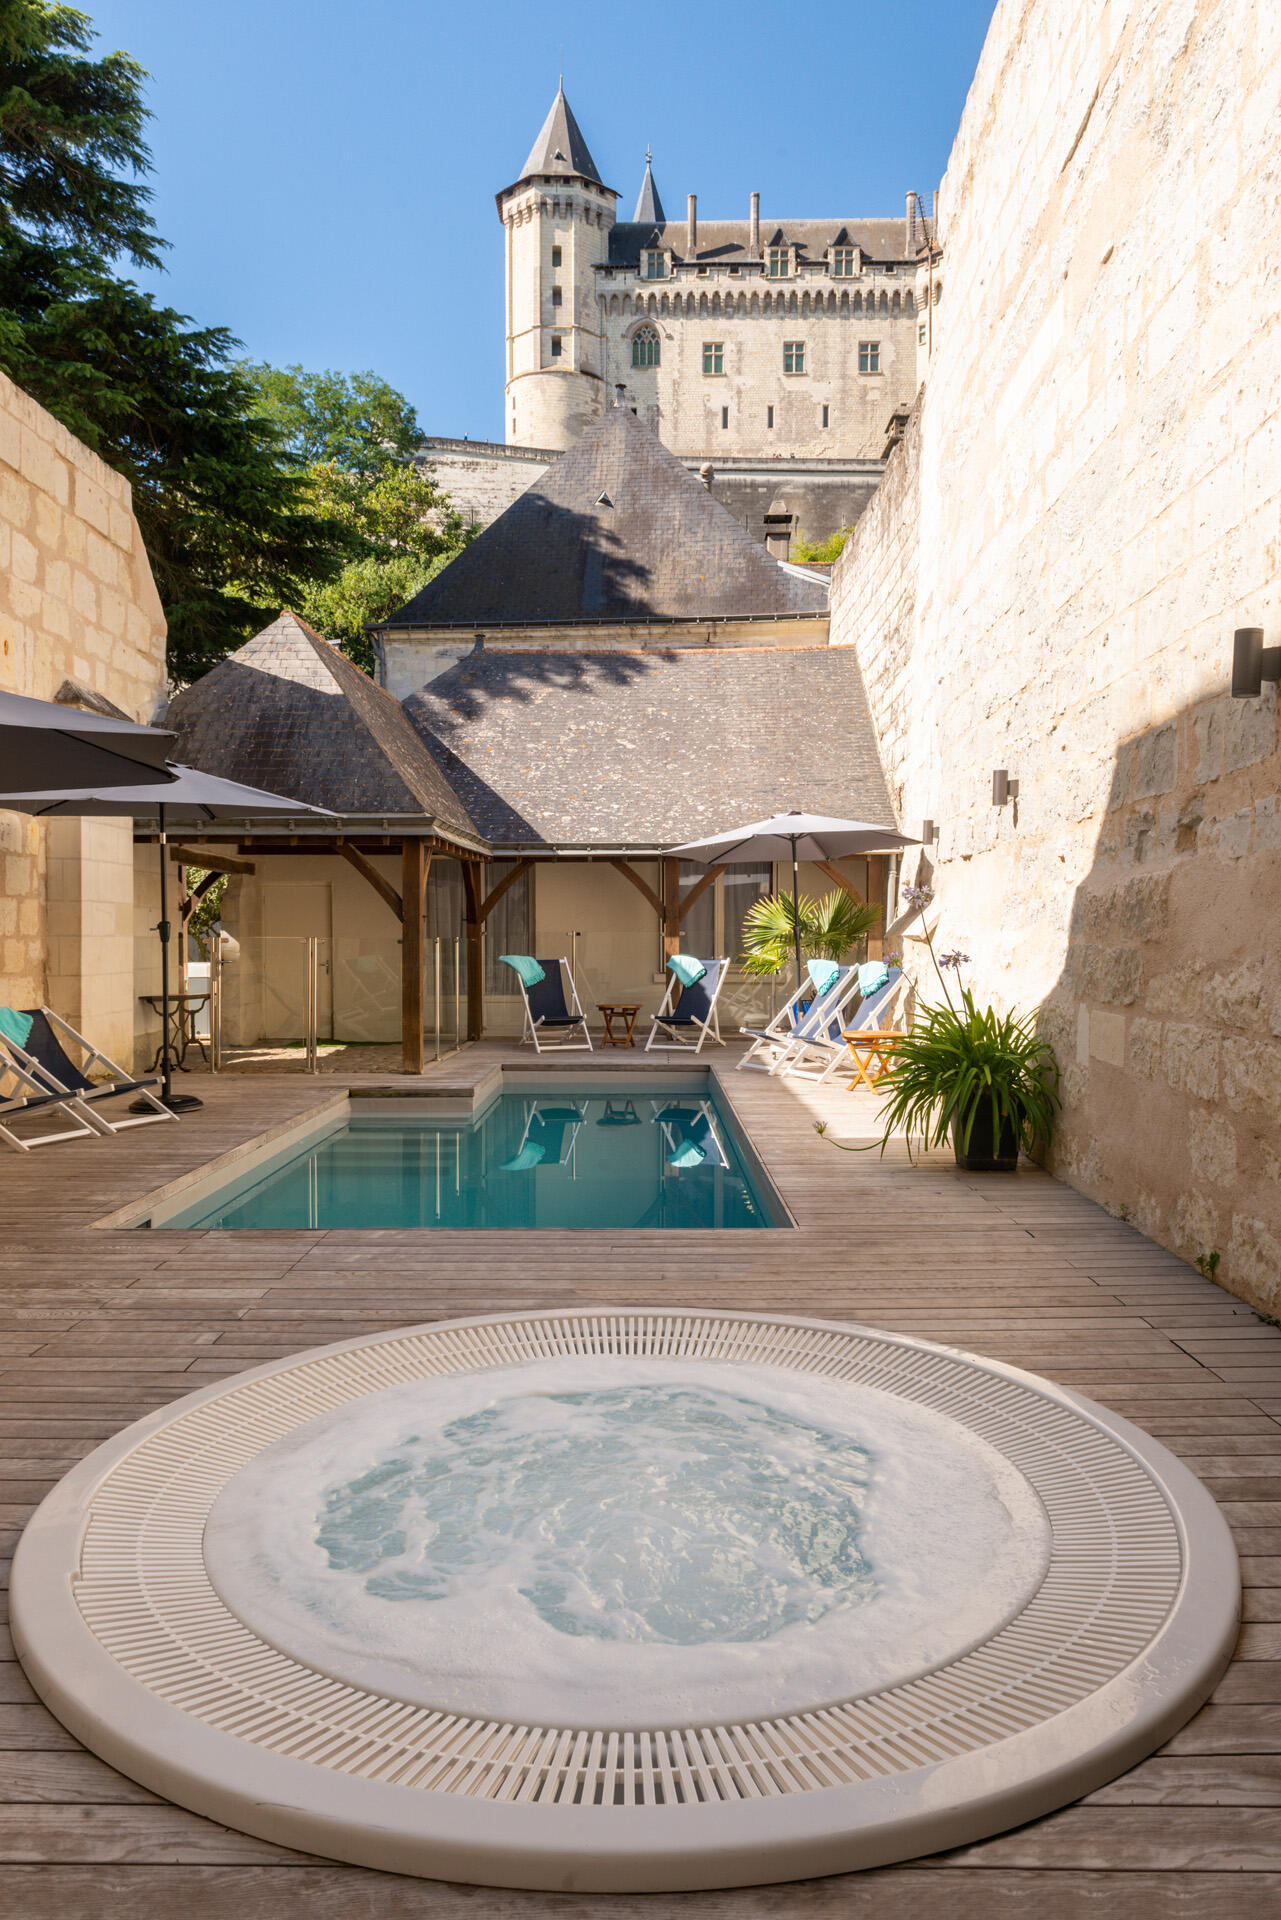 Pool at Hotel Anne d'Anjou in Saumur, France